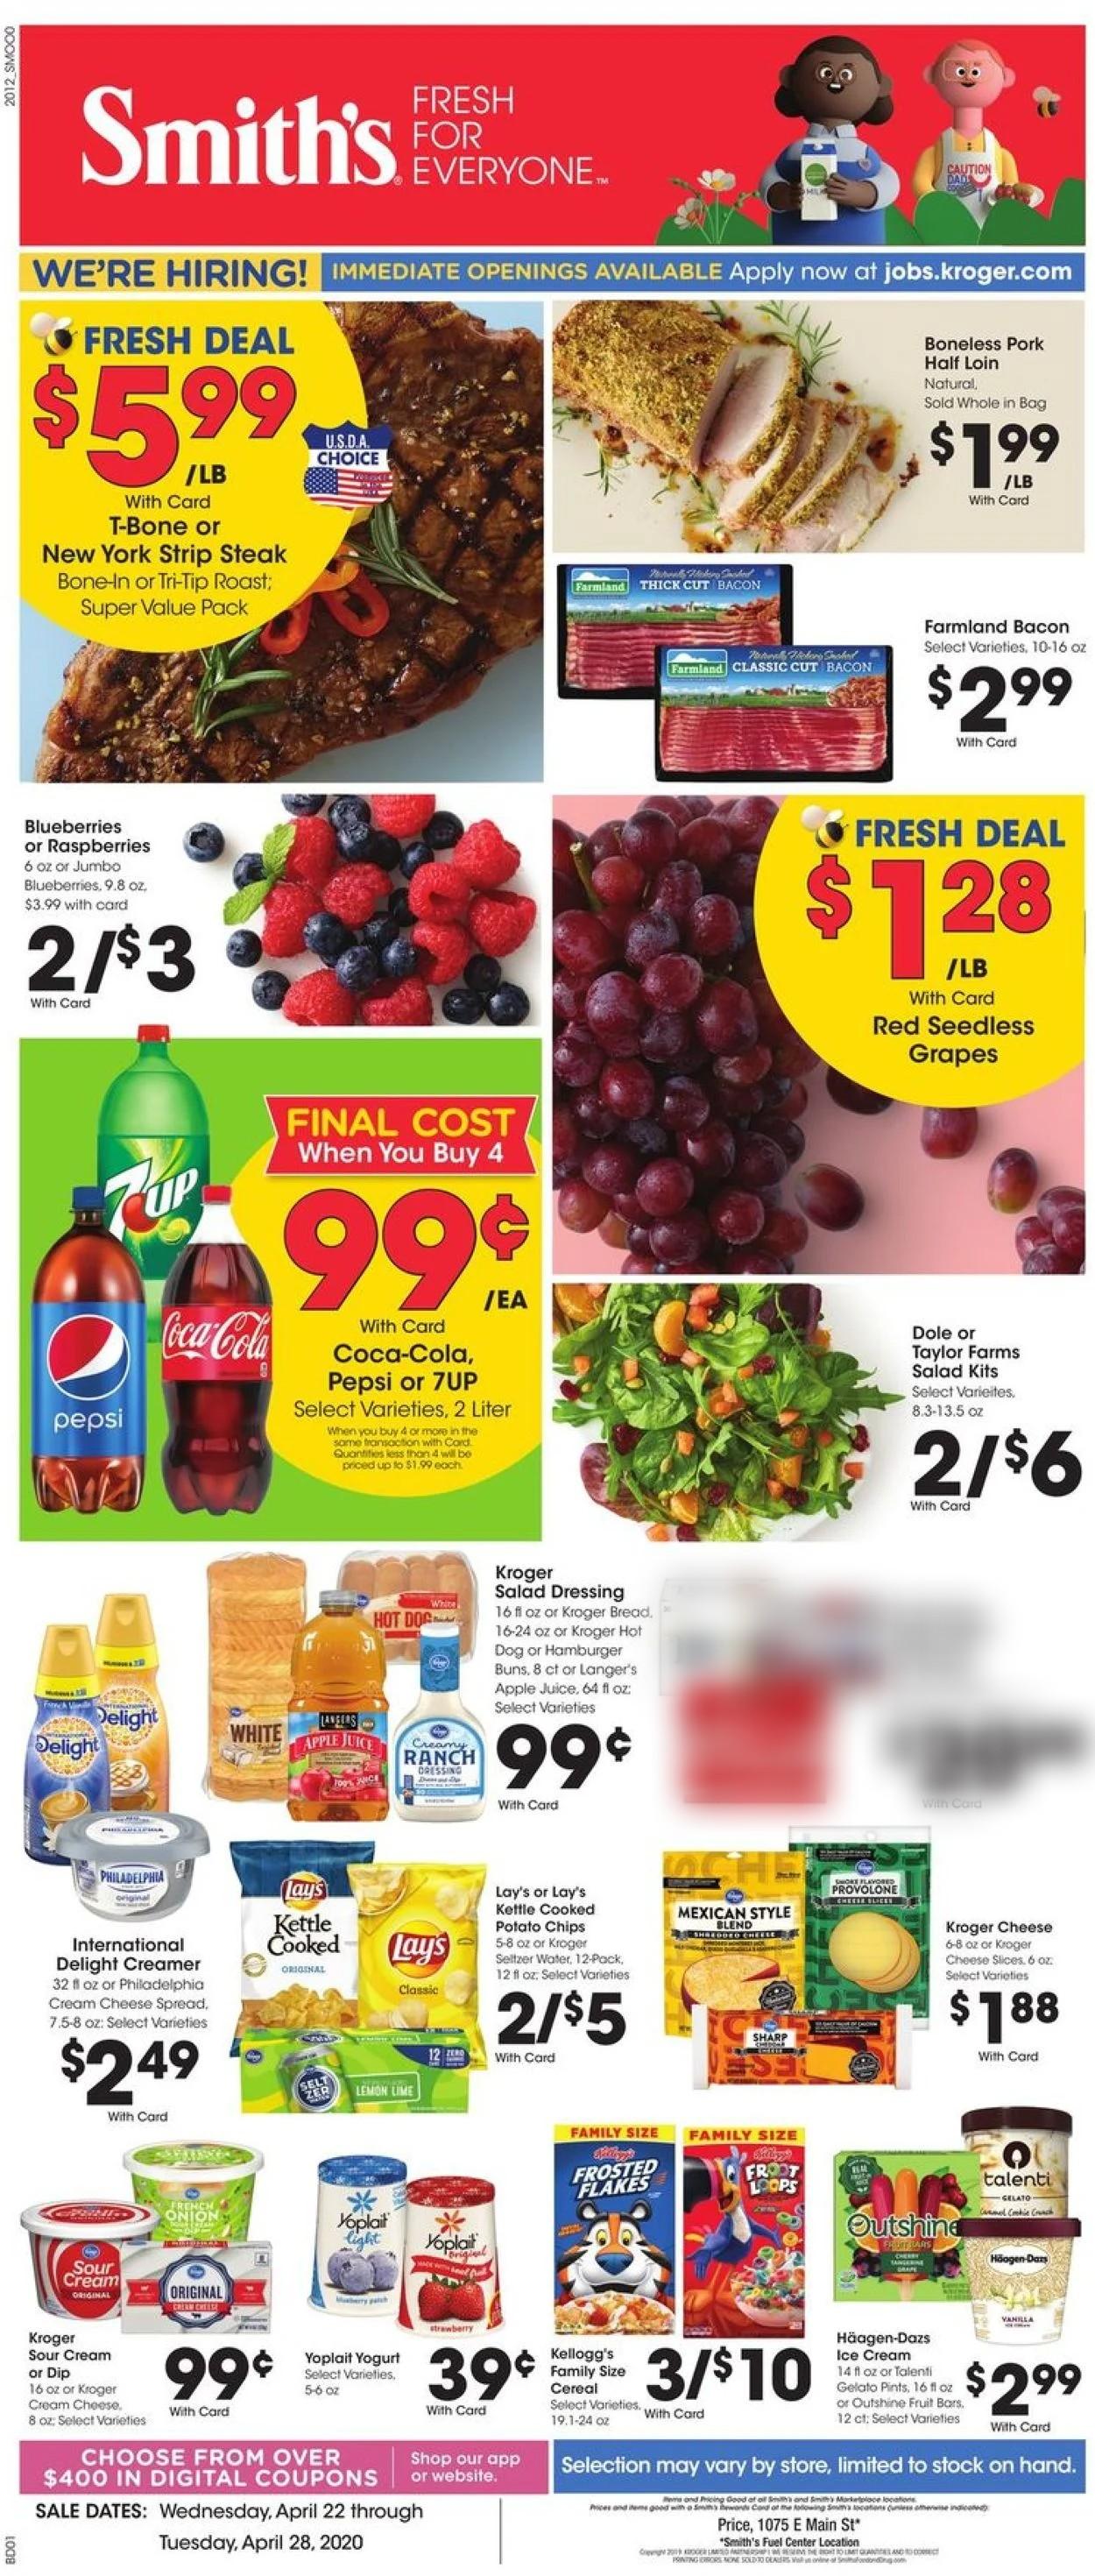 Smith's Weekly Ad Circular - valid 04/22-04/28/2020